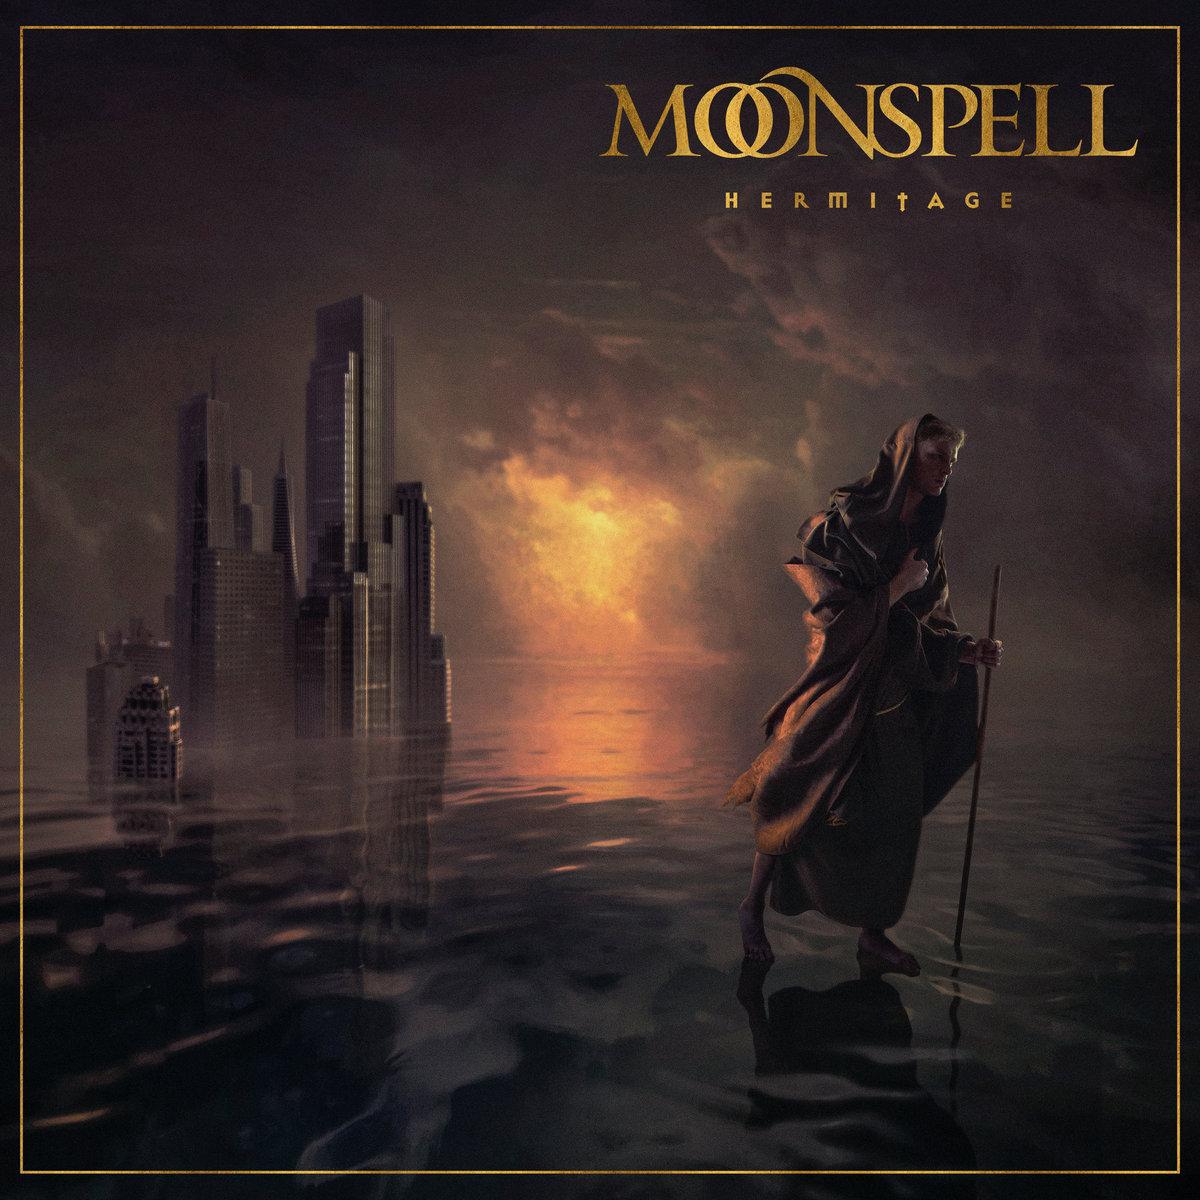 Moonspell – Heritage